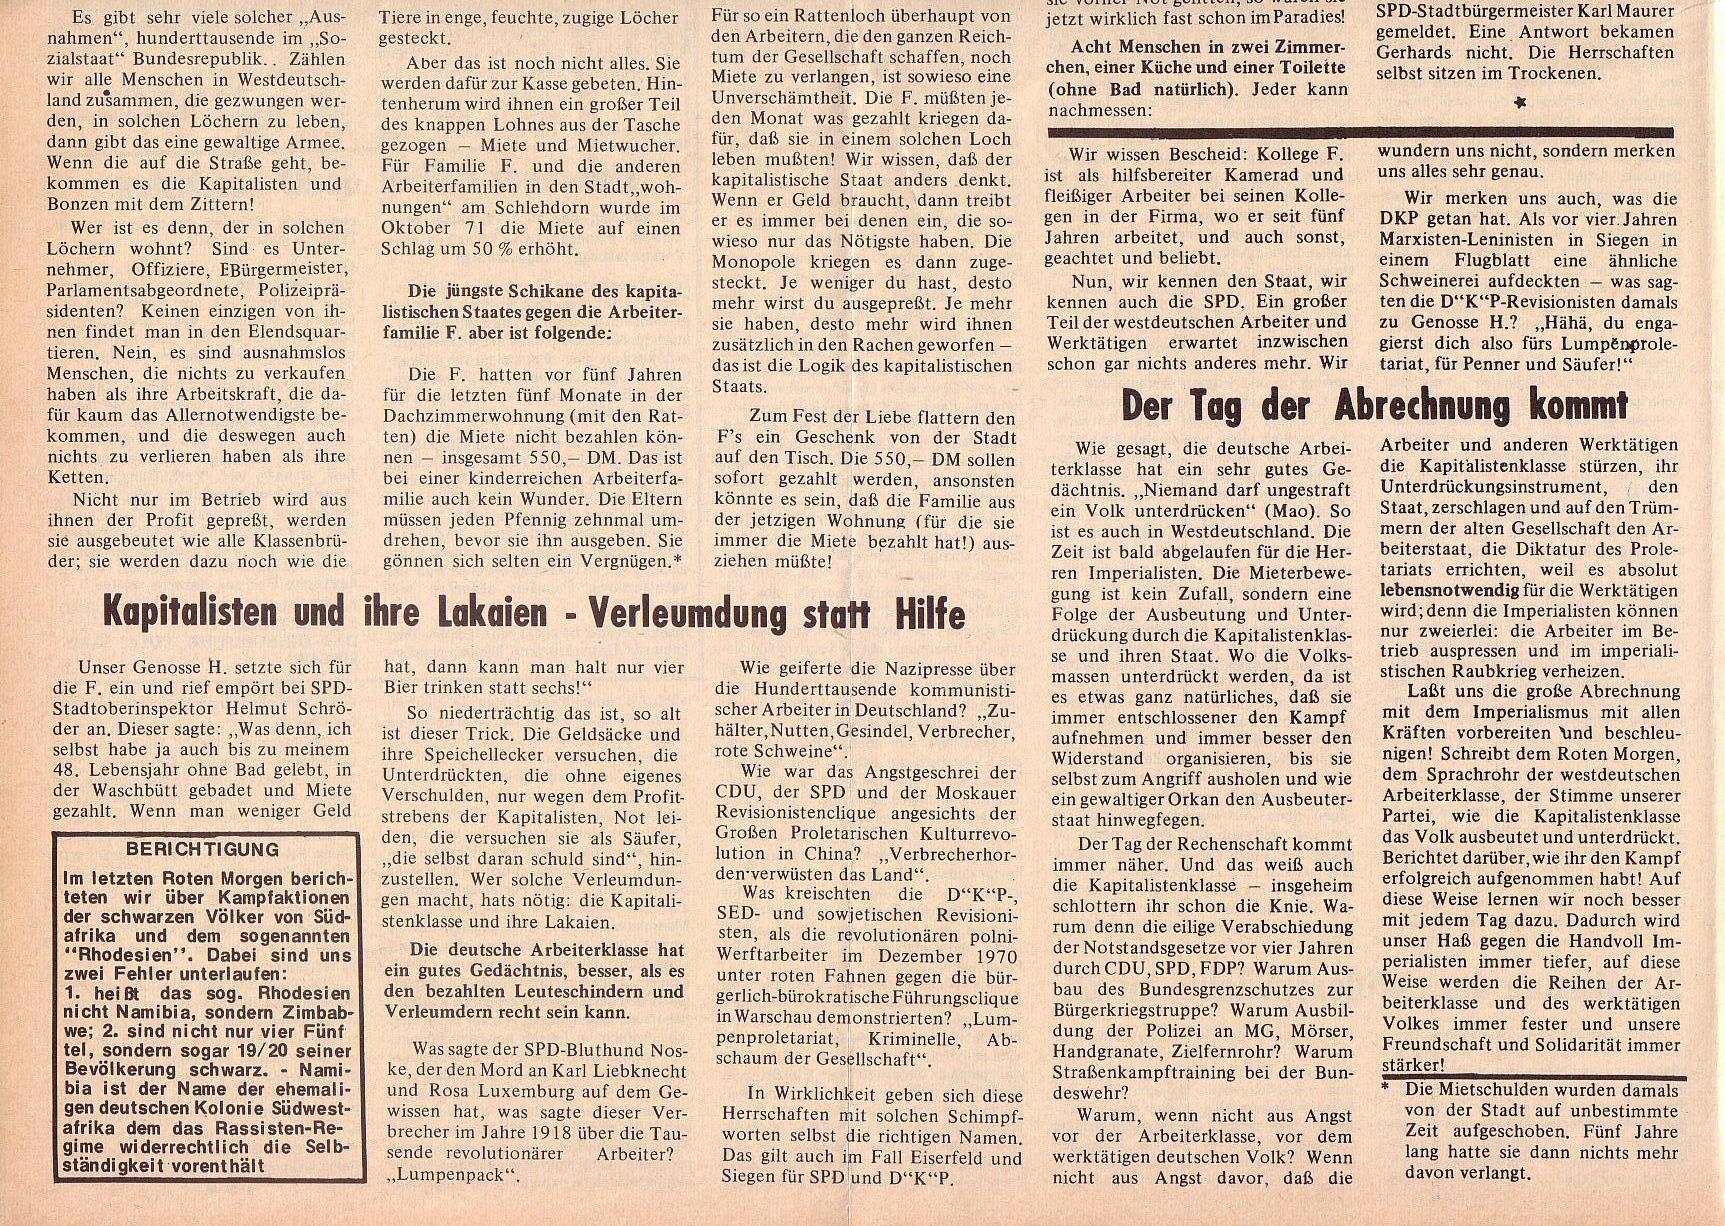 Roter Morgen, 6. Jg., 14. Februar 1972, Nr. 4, Seite 8b